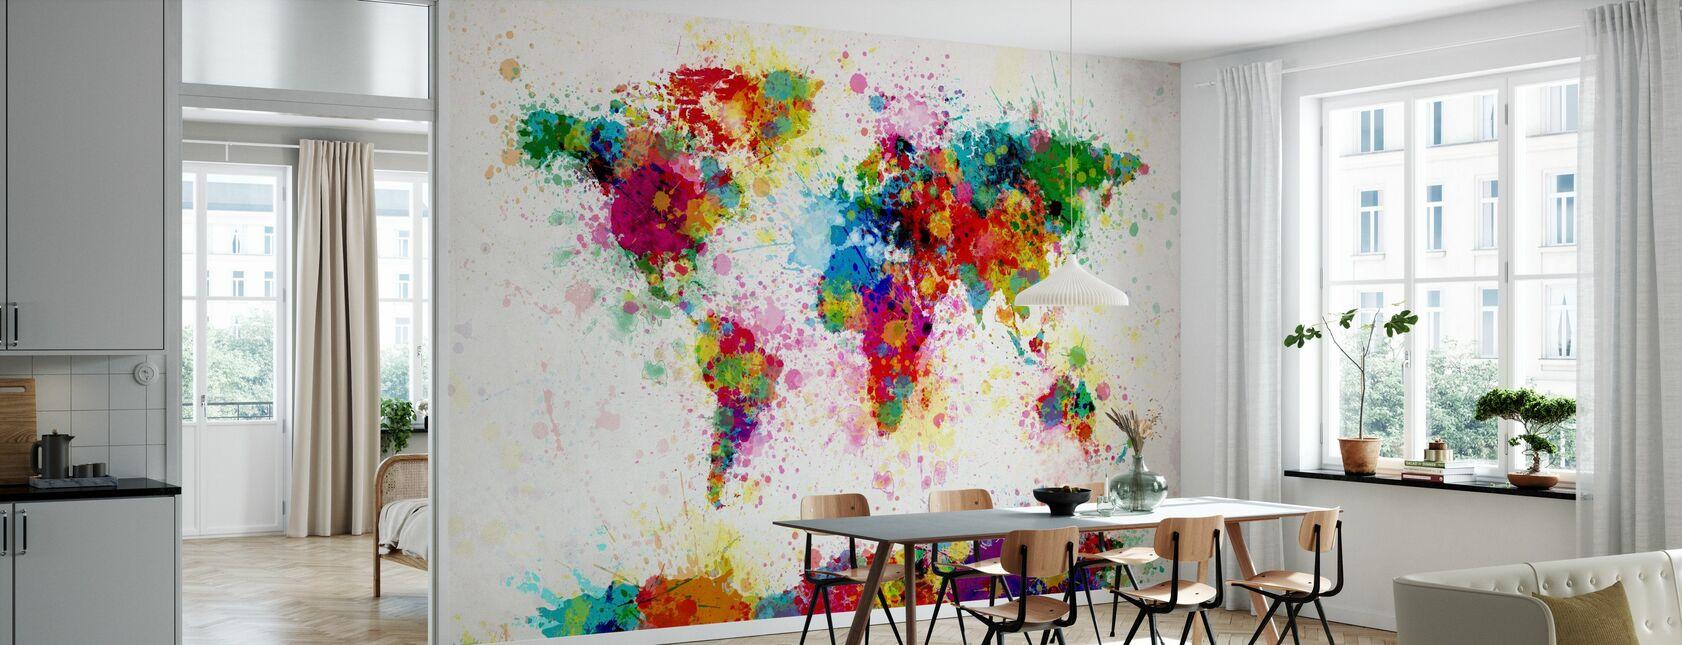 Paint Splashes Map - Wallpaper - Kitchen